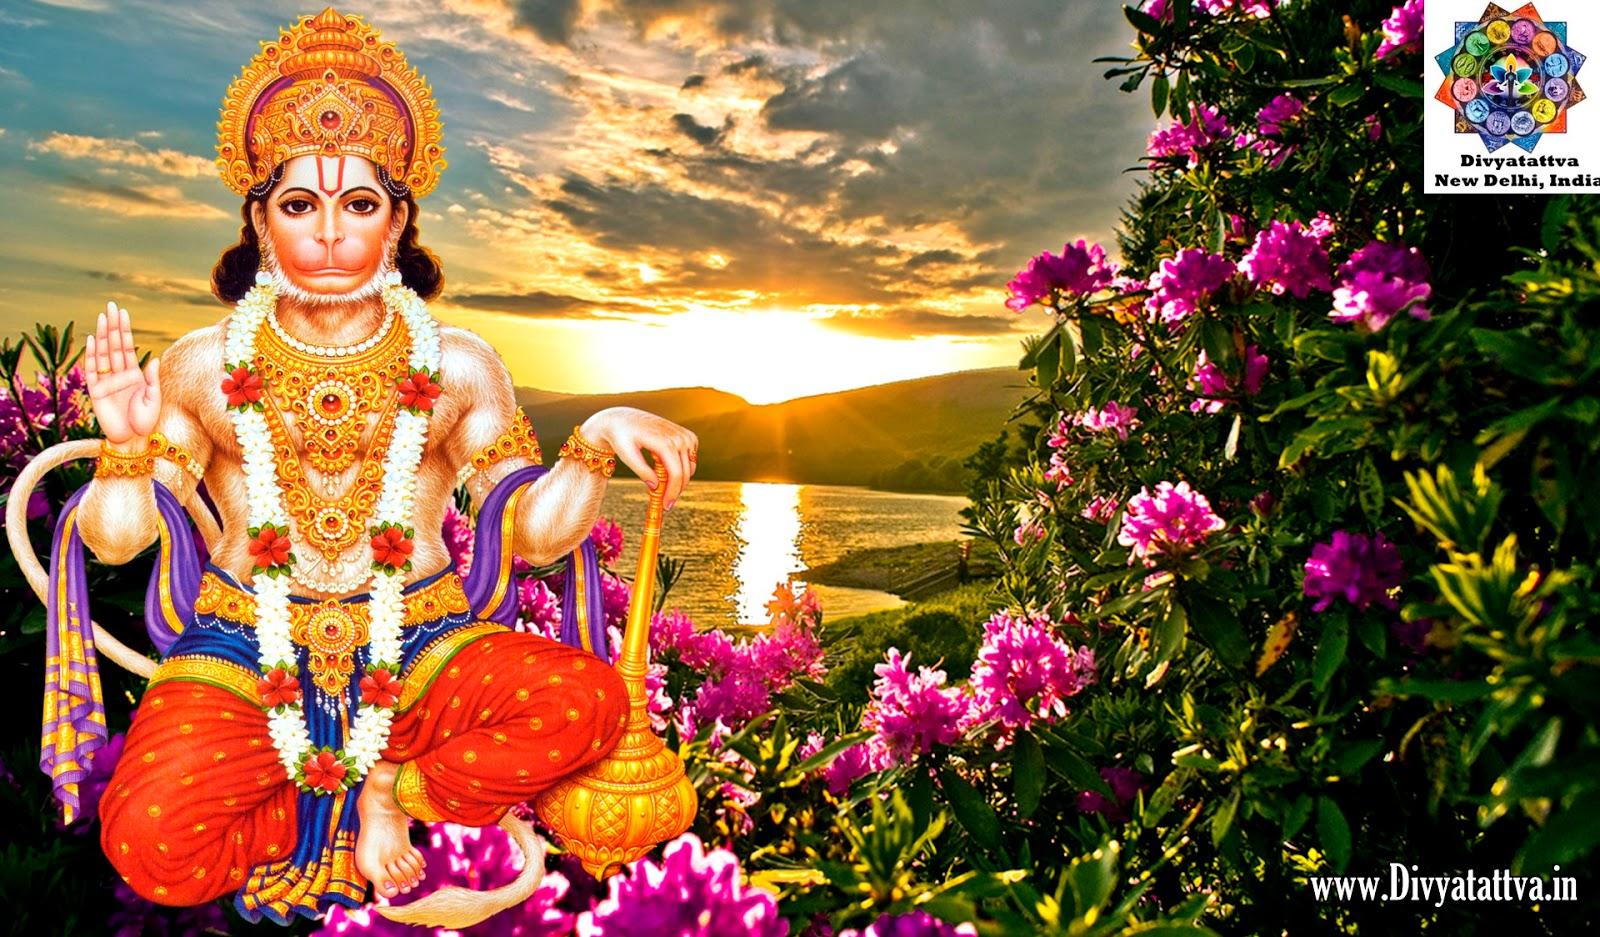 God Hanuman Free Hd Wallpaper Downloads, Free Lord - Radha Krishna Hd Wallpaper Download - HD Wallpaper